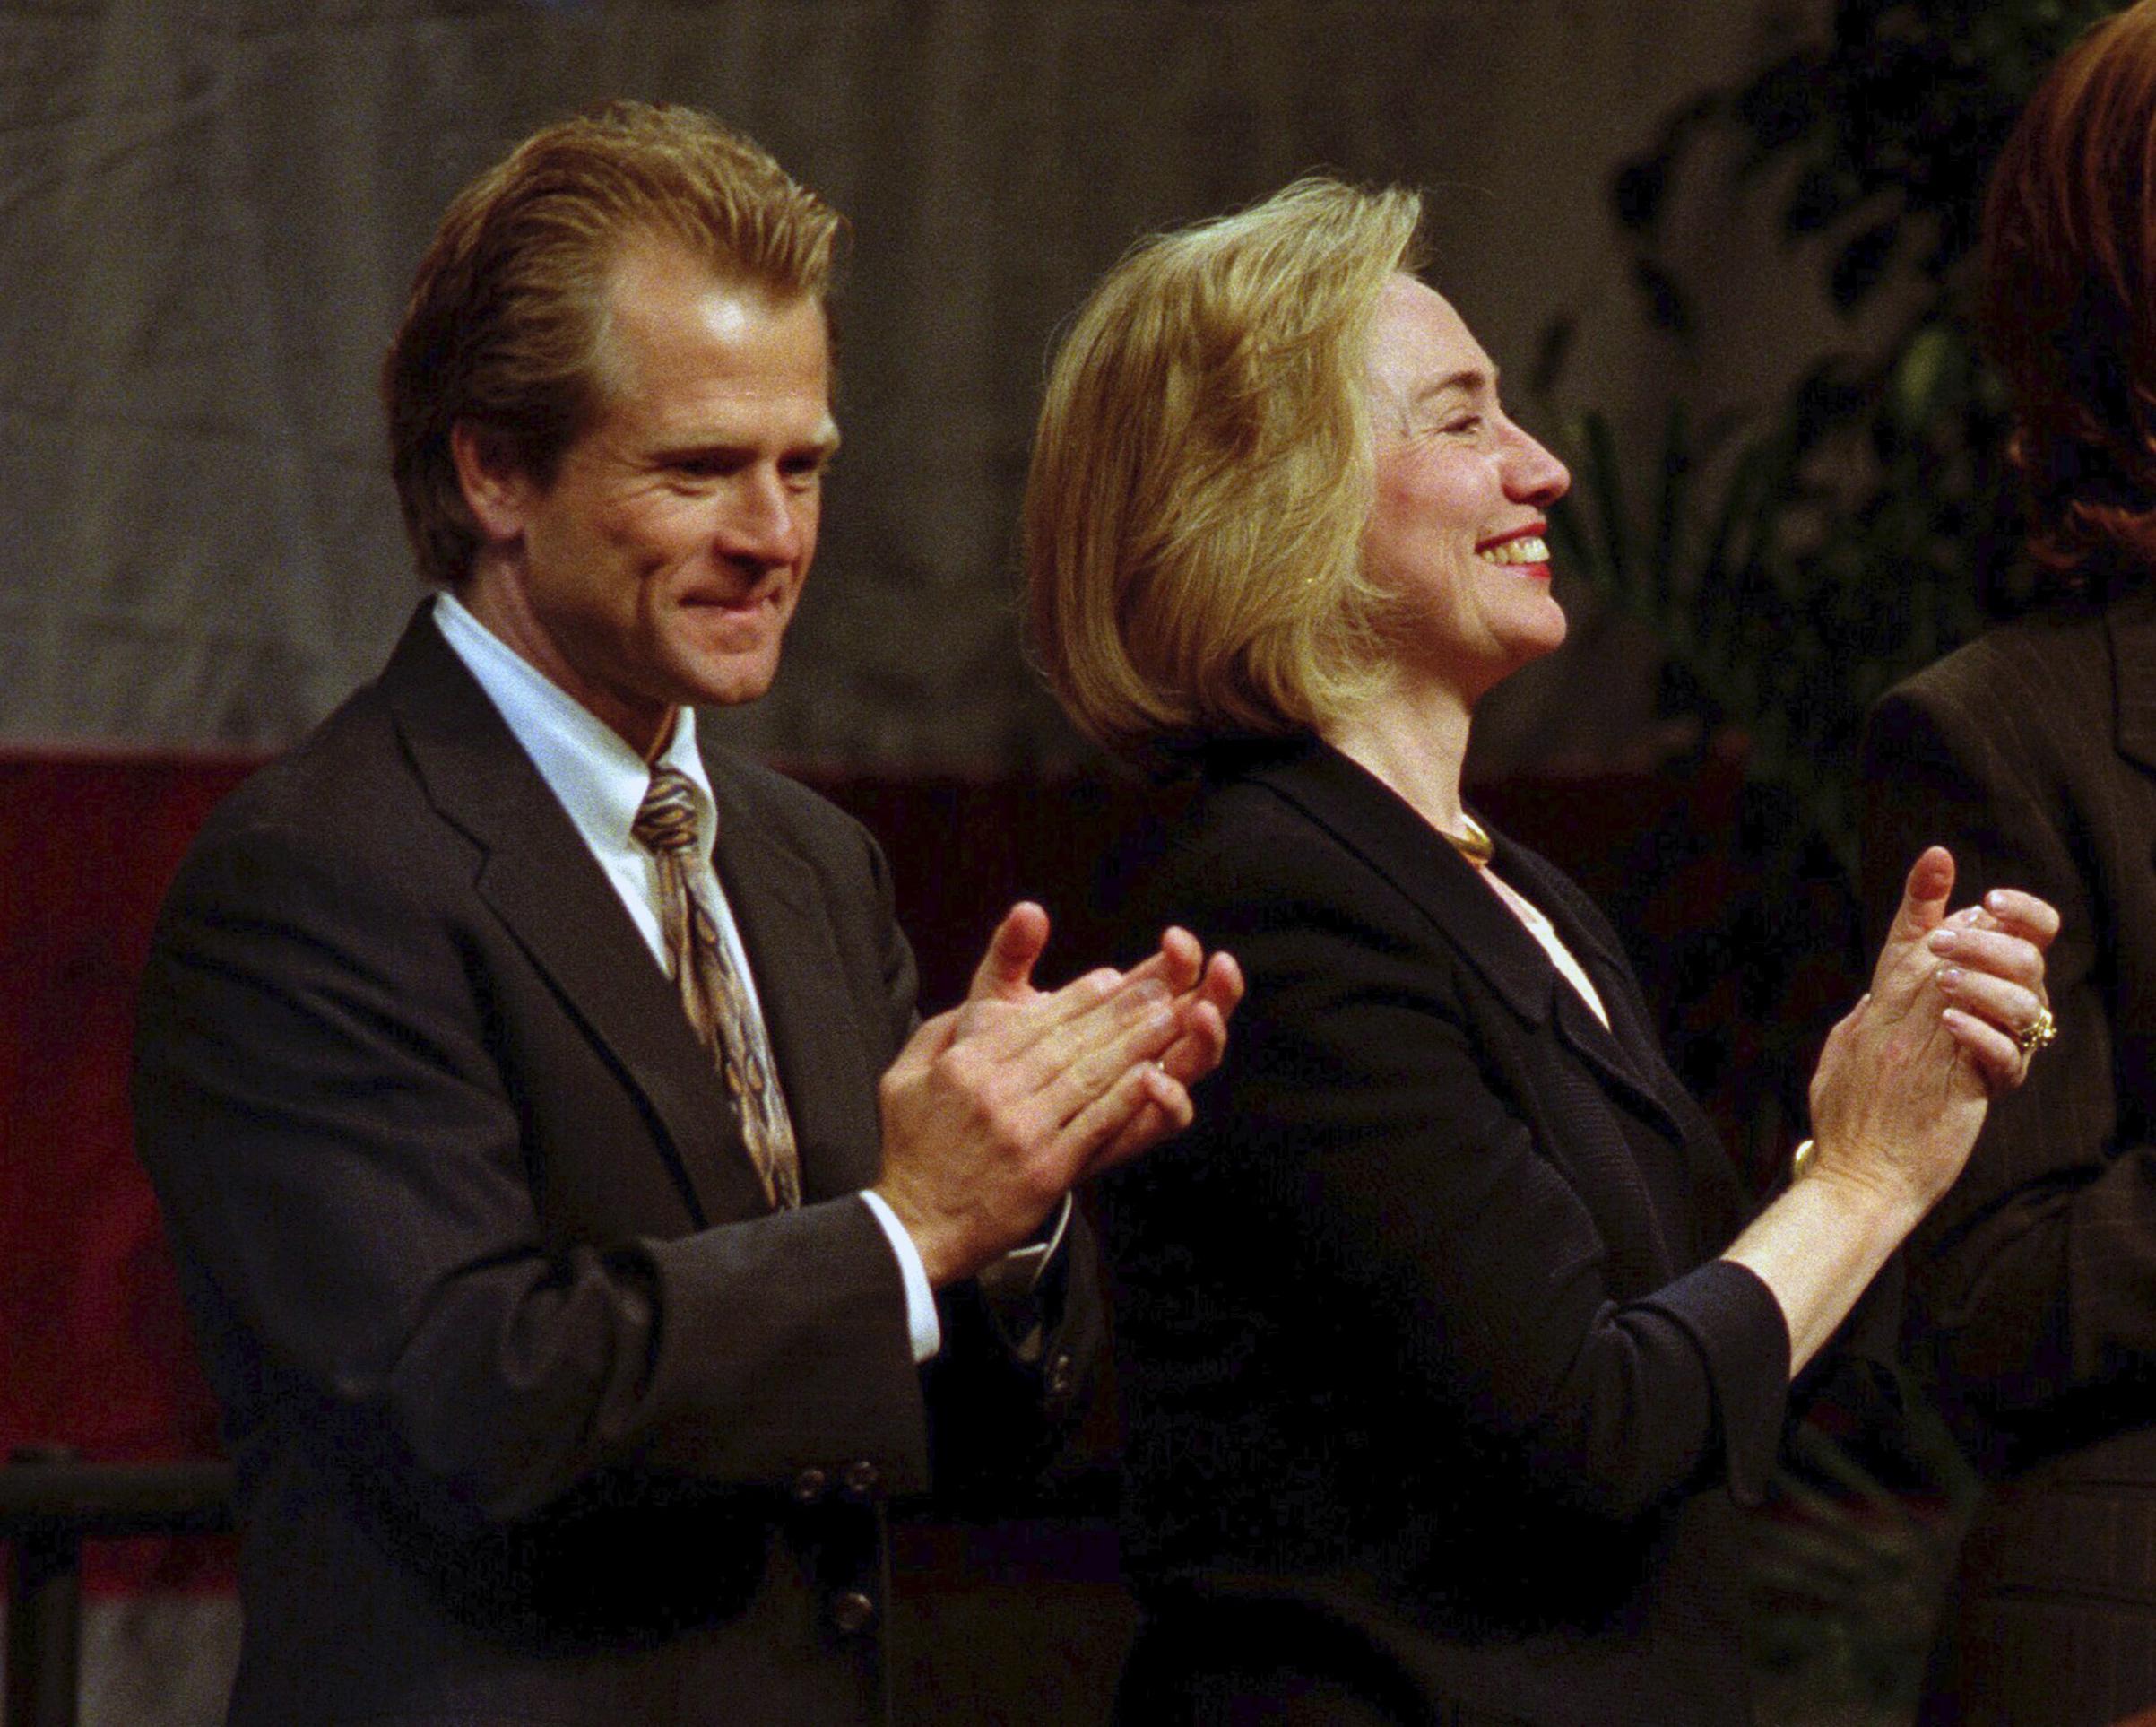 Hillary Clinton campaigned for Navarro in 1996, the year he ran for Congress as a progressive Democrat